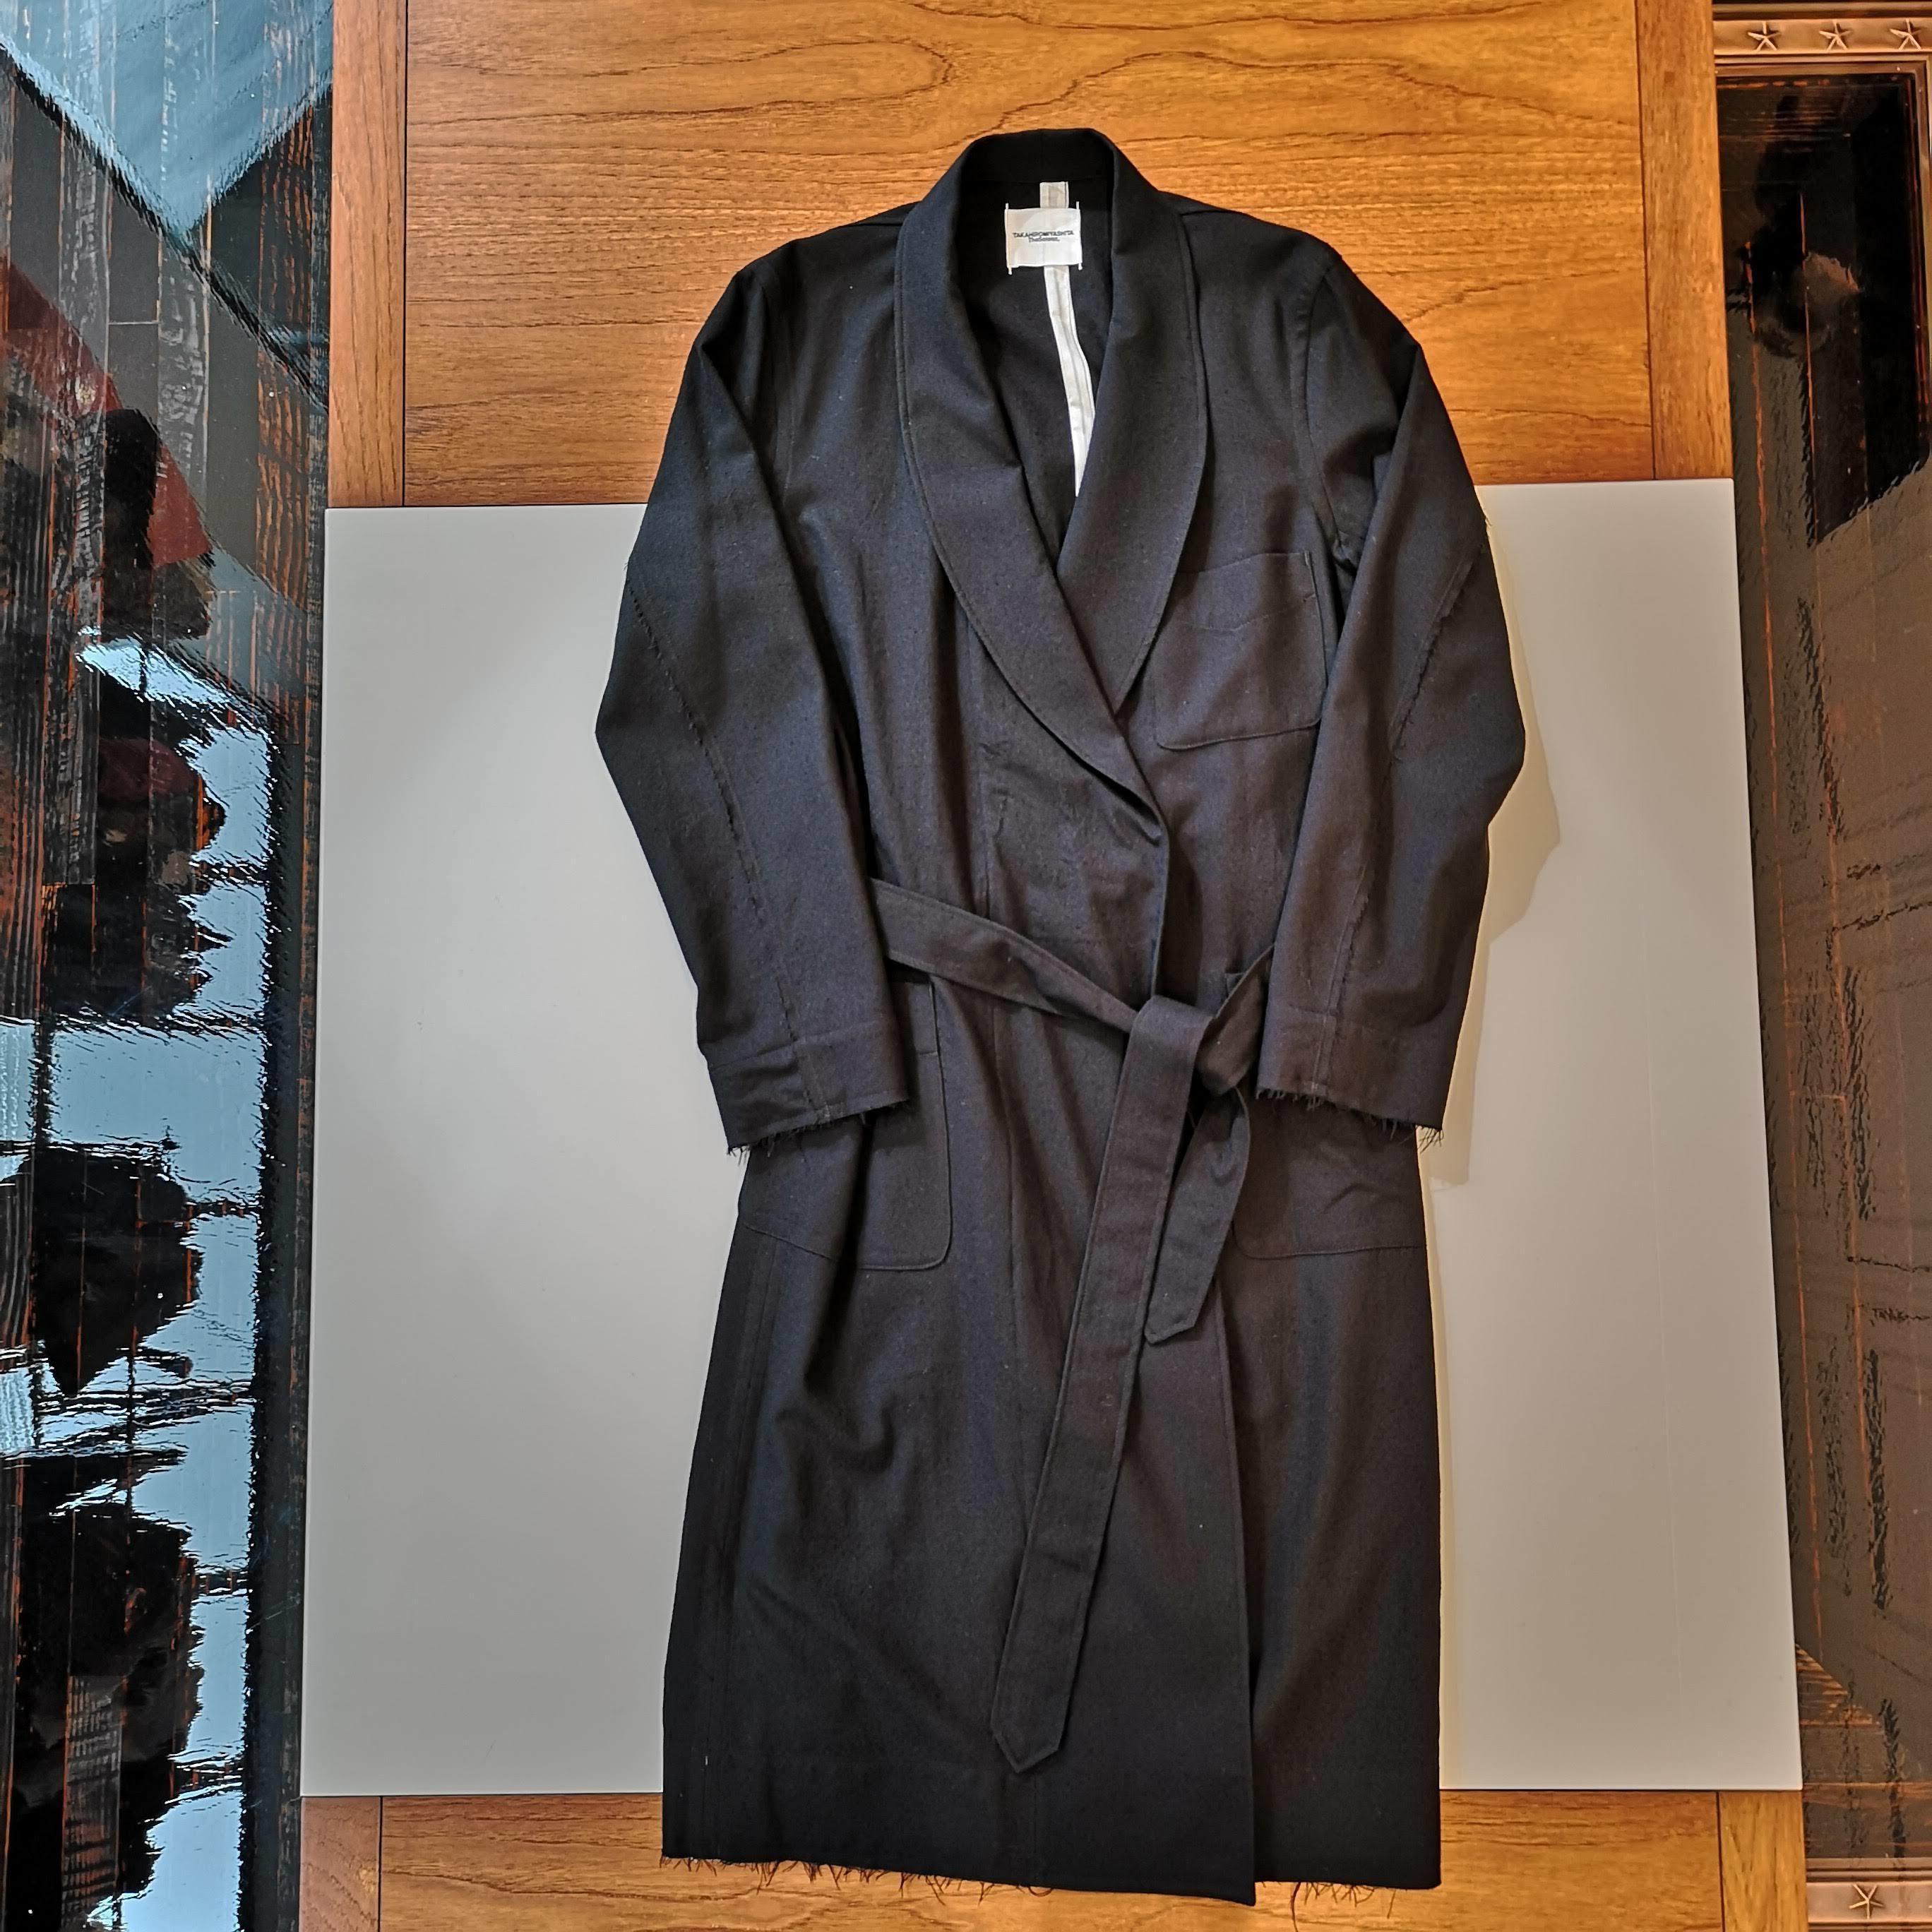 swj.0018aAW18 : robe pajama shirt.